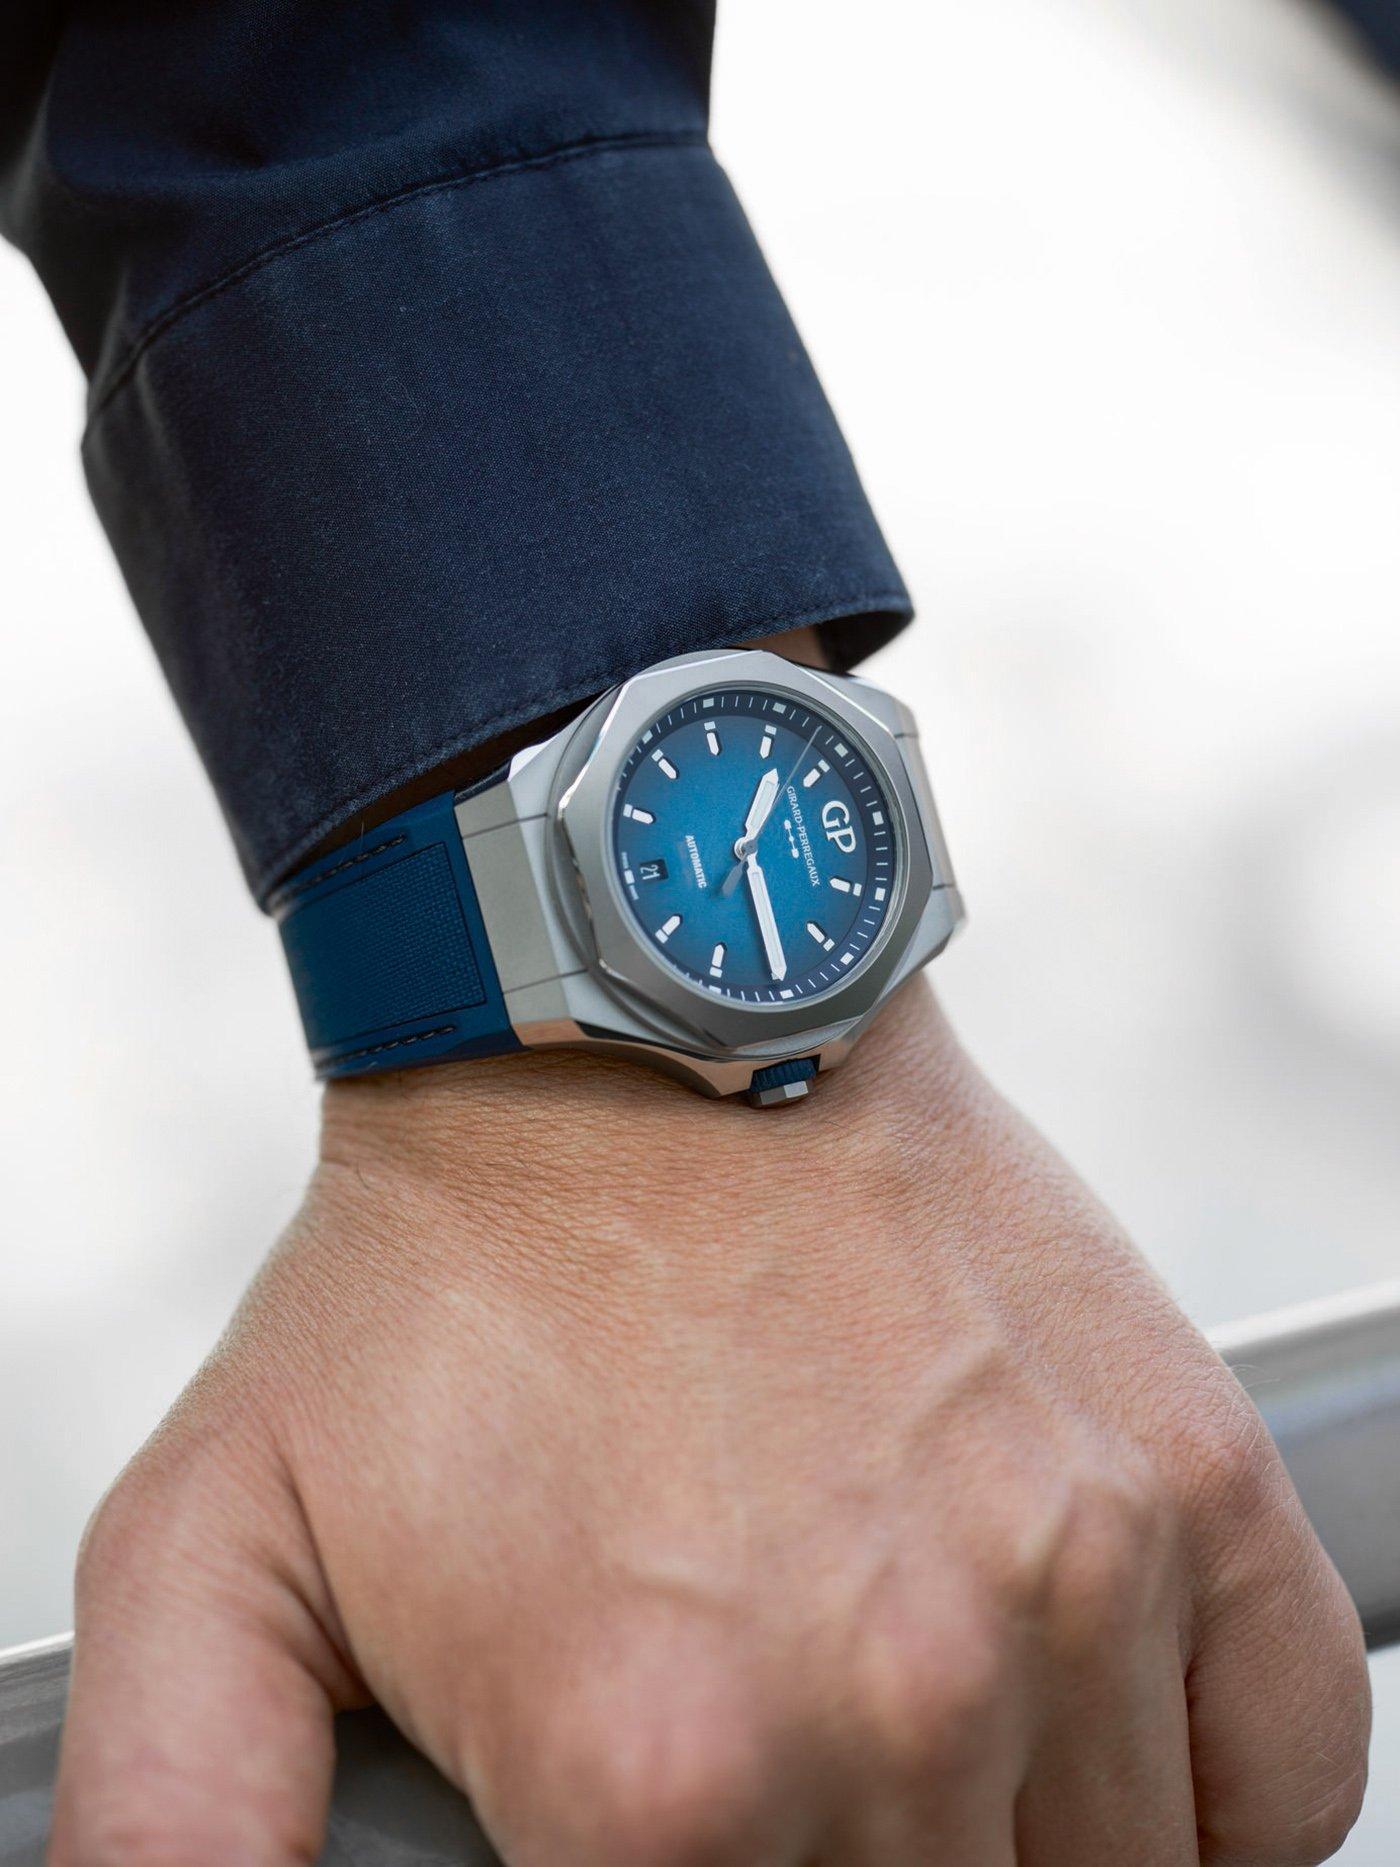 Girard-Perregaux представляет лимитированную серию часов Laureato Absolute Ti 230